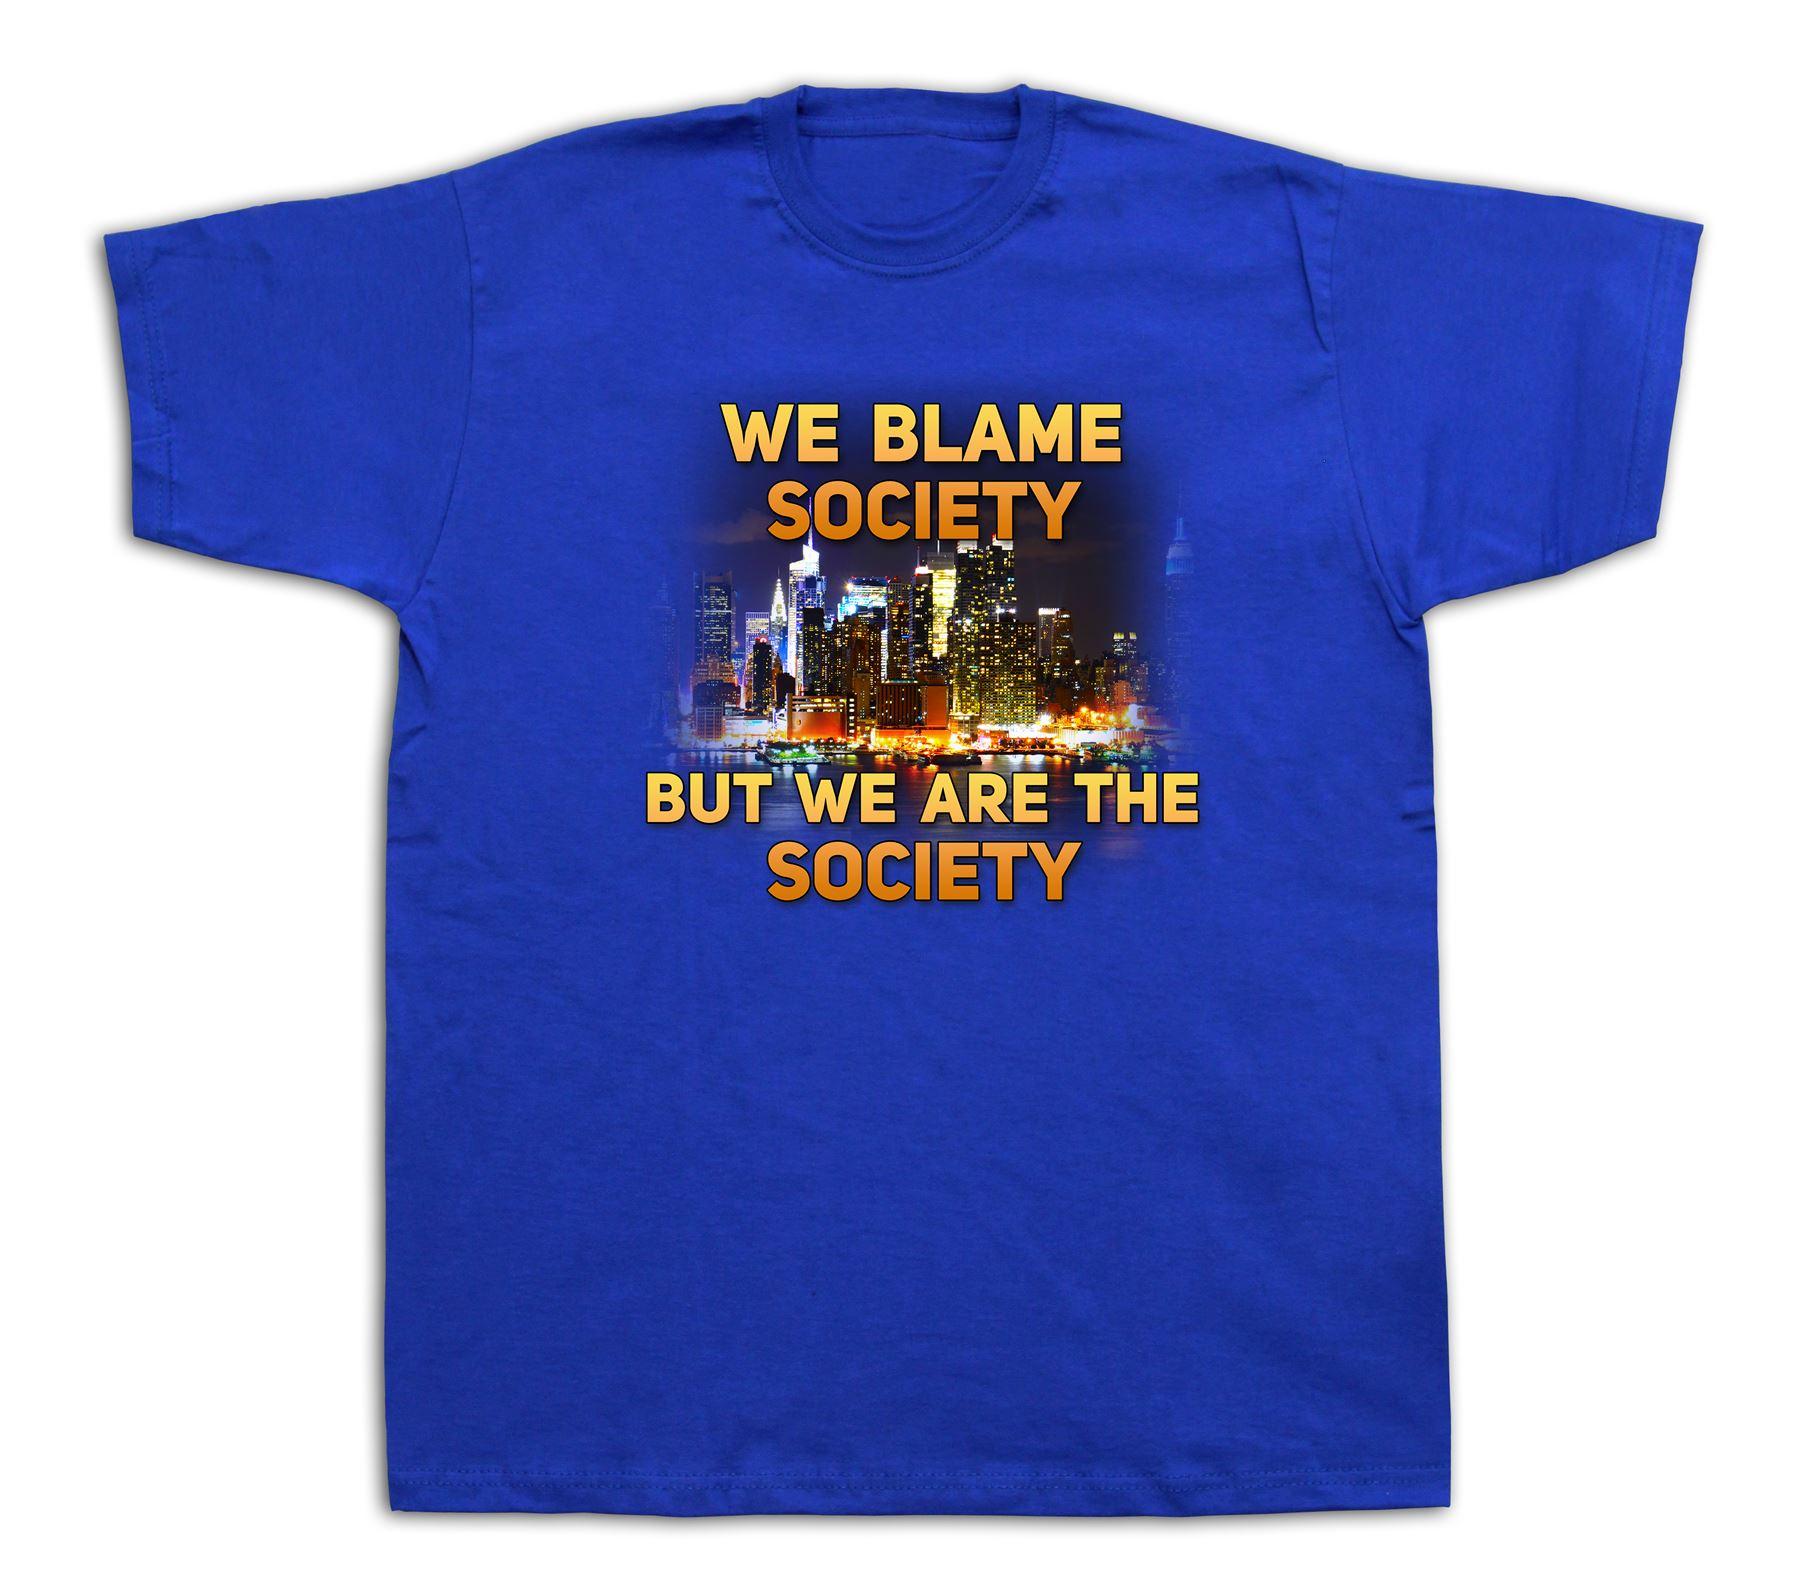 Blame society jayz music NYC city T shirt cotton tee ...